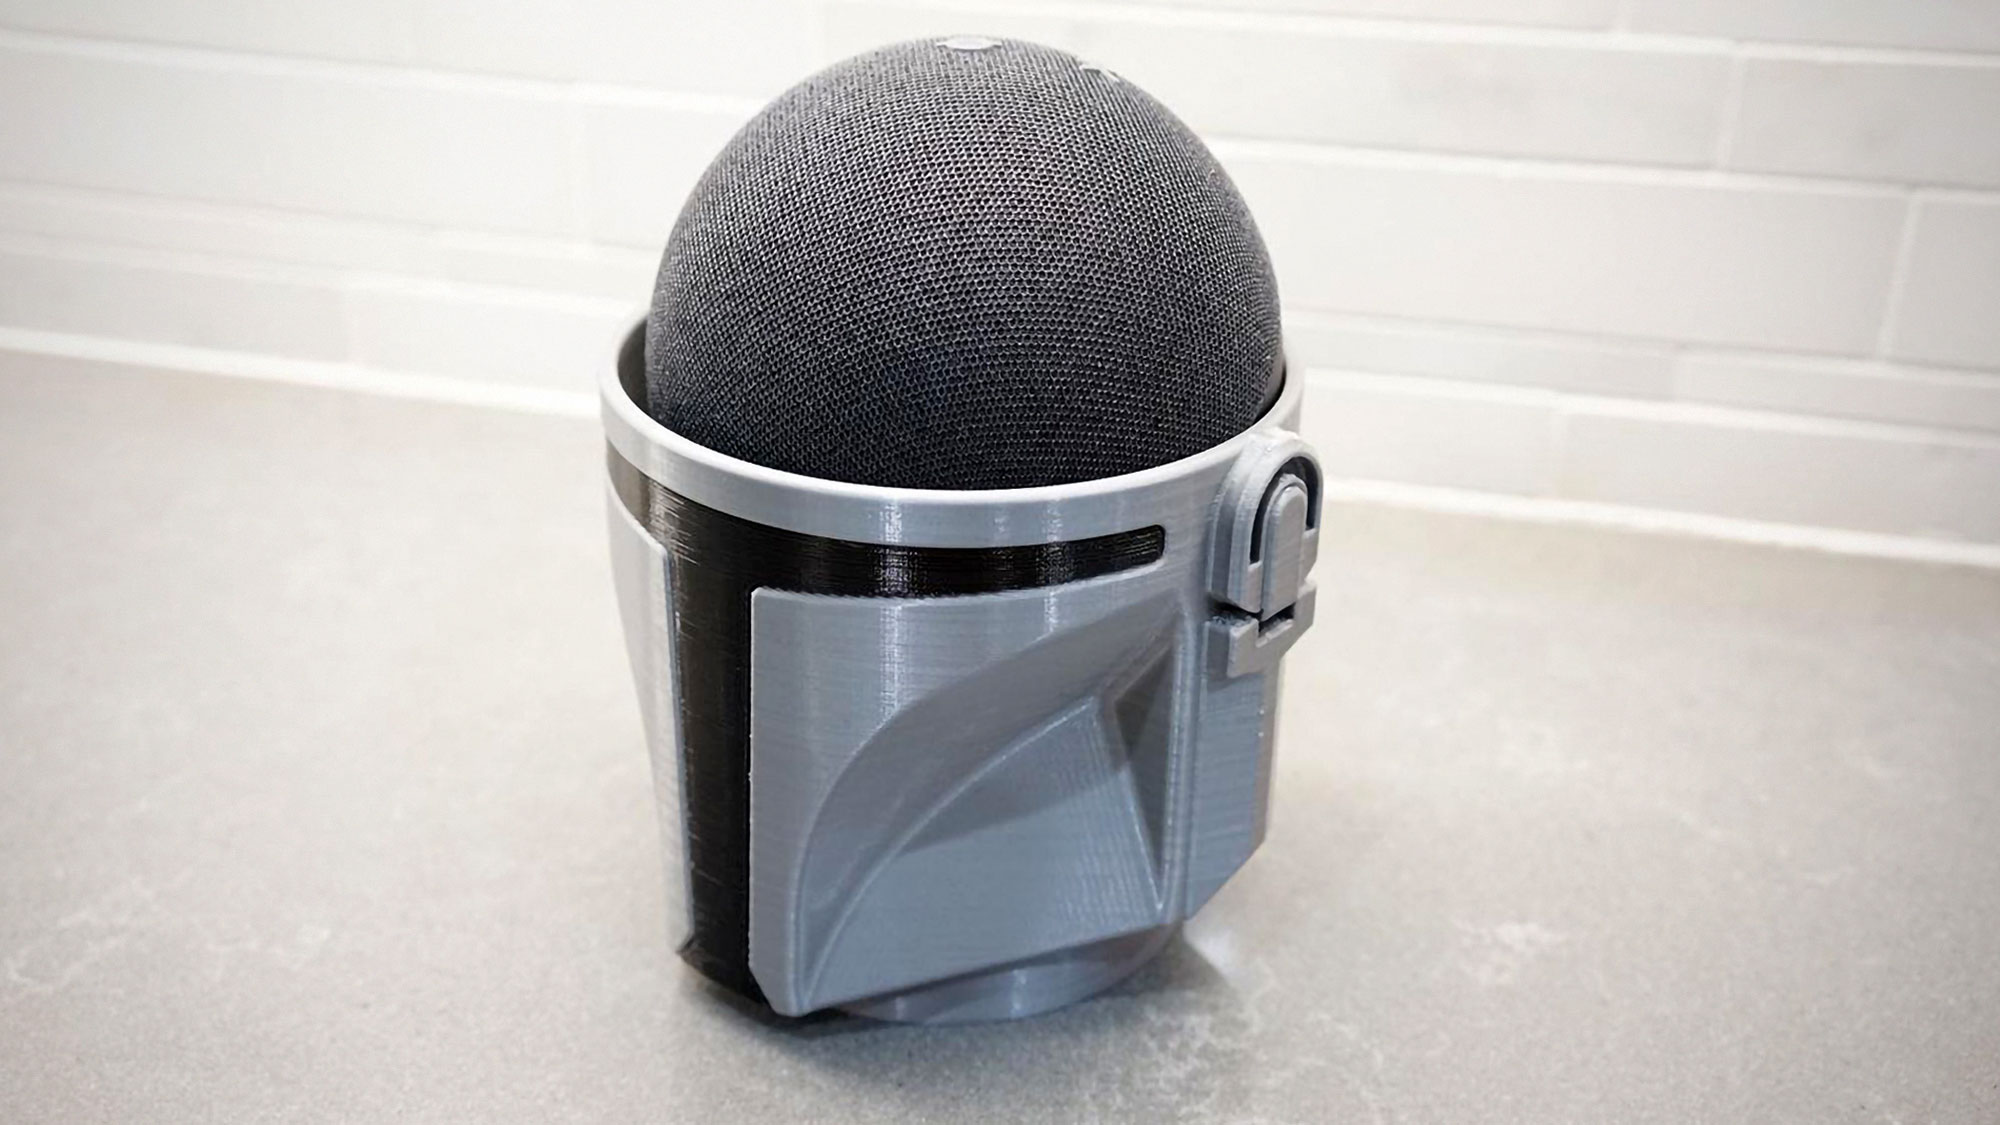 The Mandalorian Amazon Echo Dot Speaker Holder